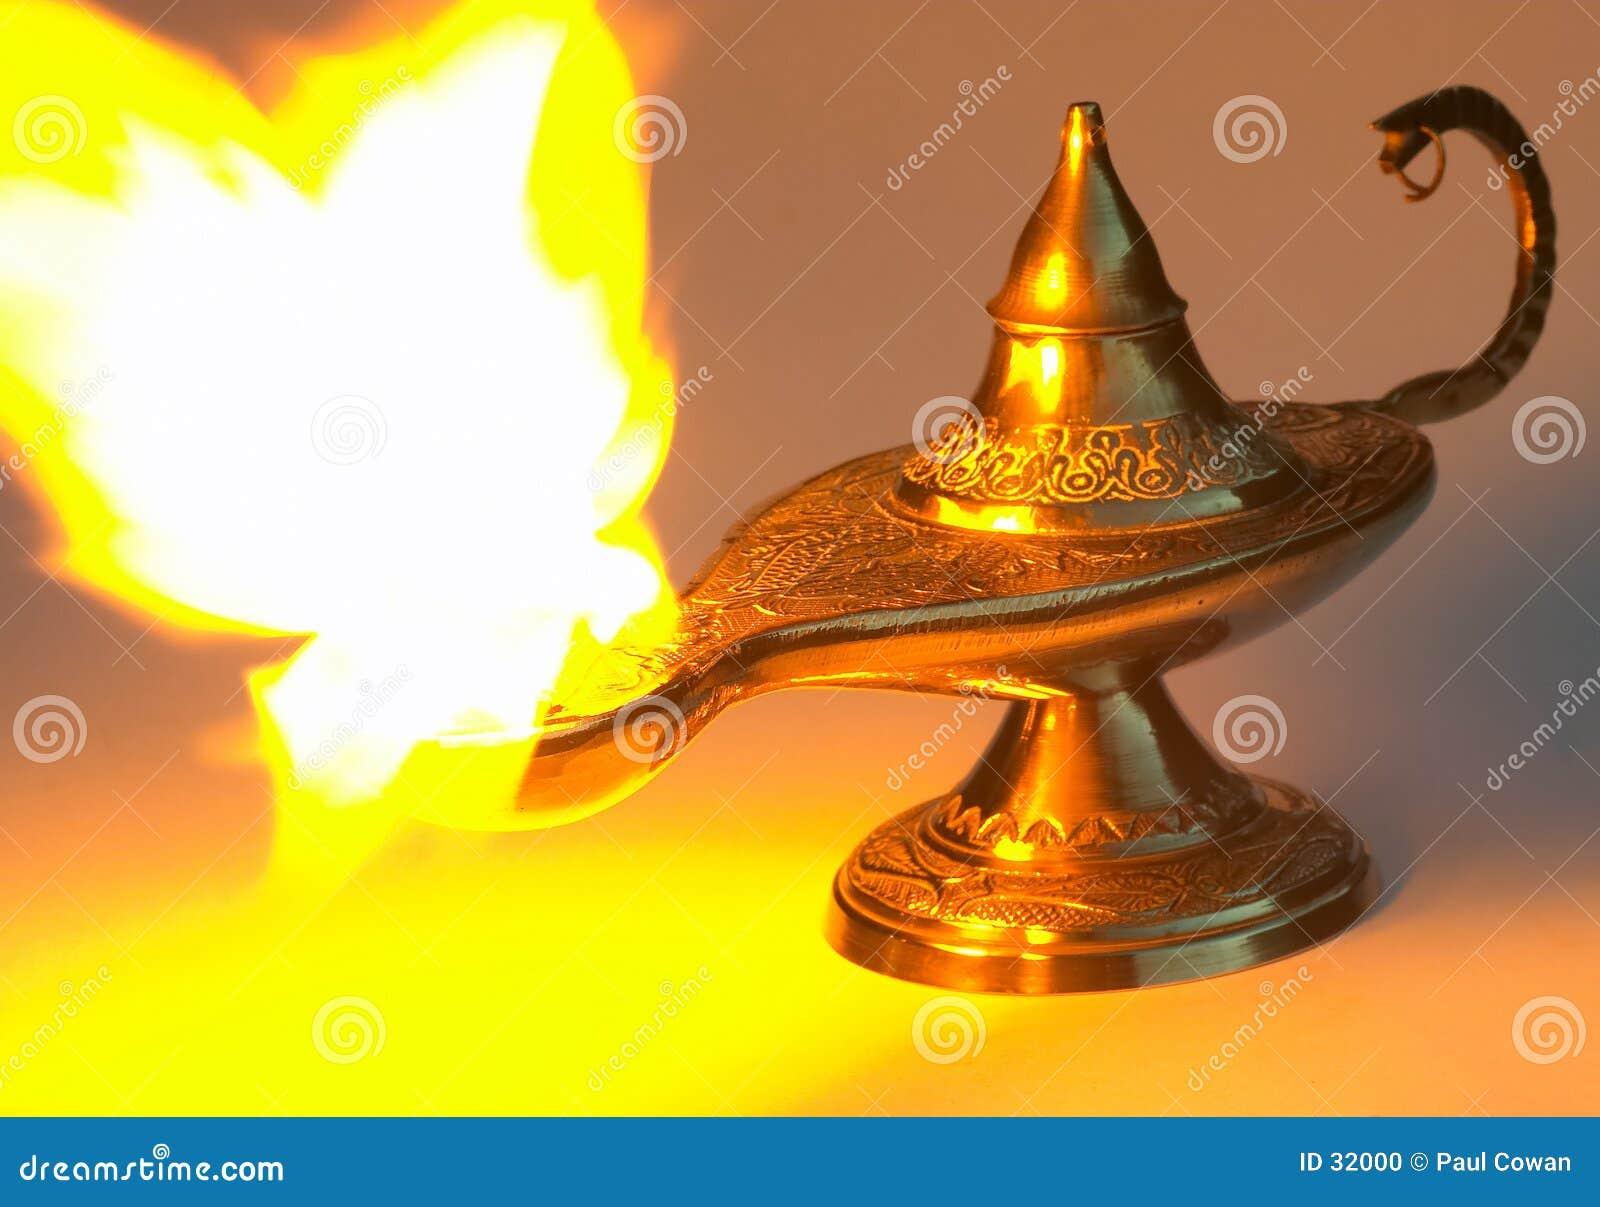 Aladdin s lamp - yellow version